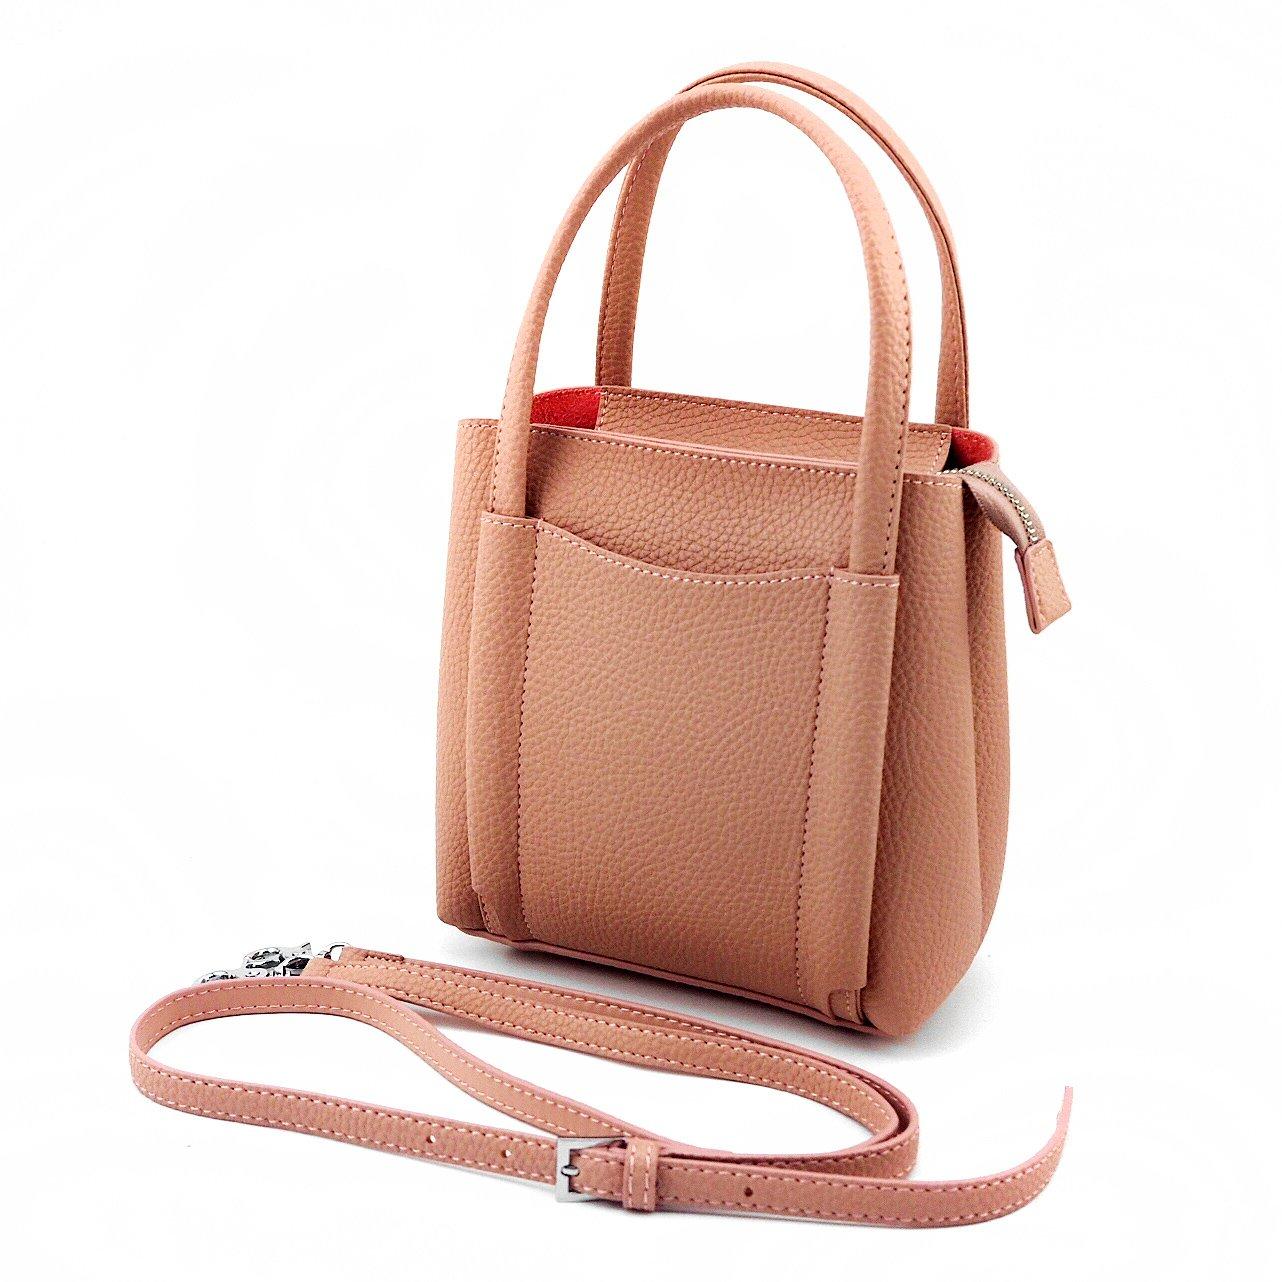 9e65113cc9b2e Jieway Women Small Basic PU Leather Fashion Handbag Top-handle Bag Tote Bag  Cross-body Bag